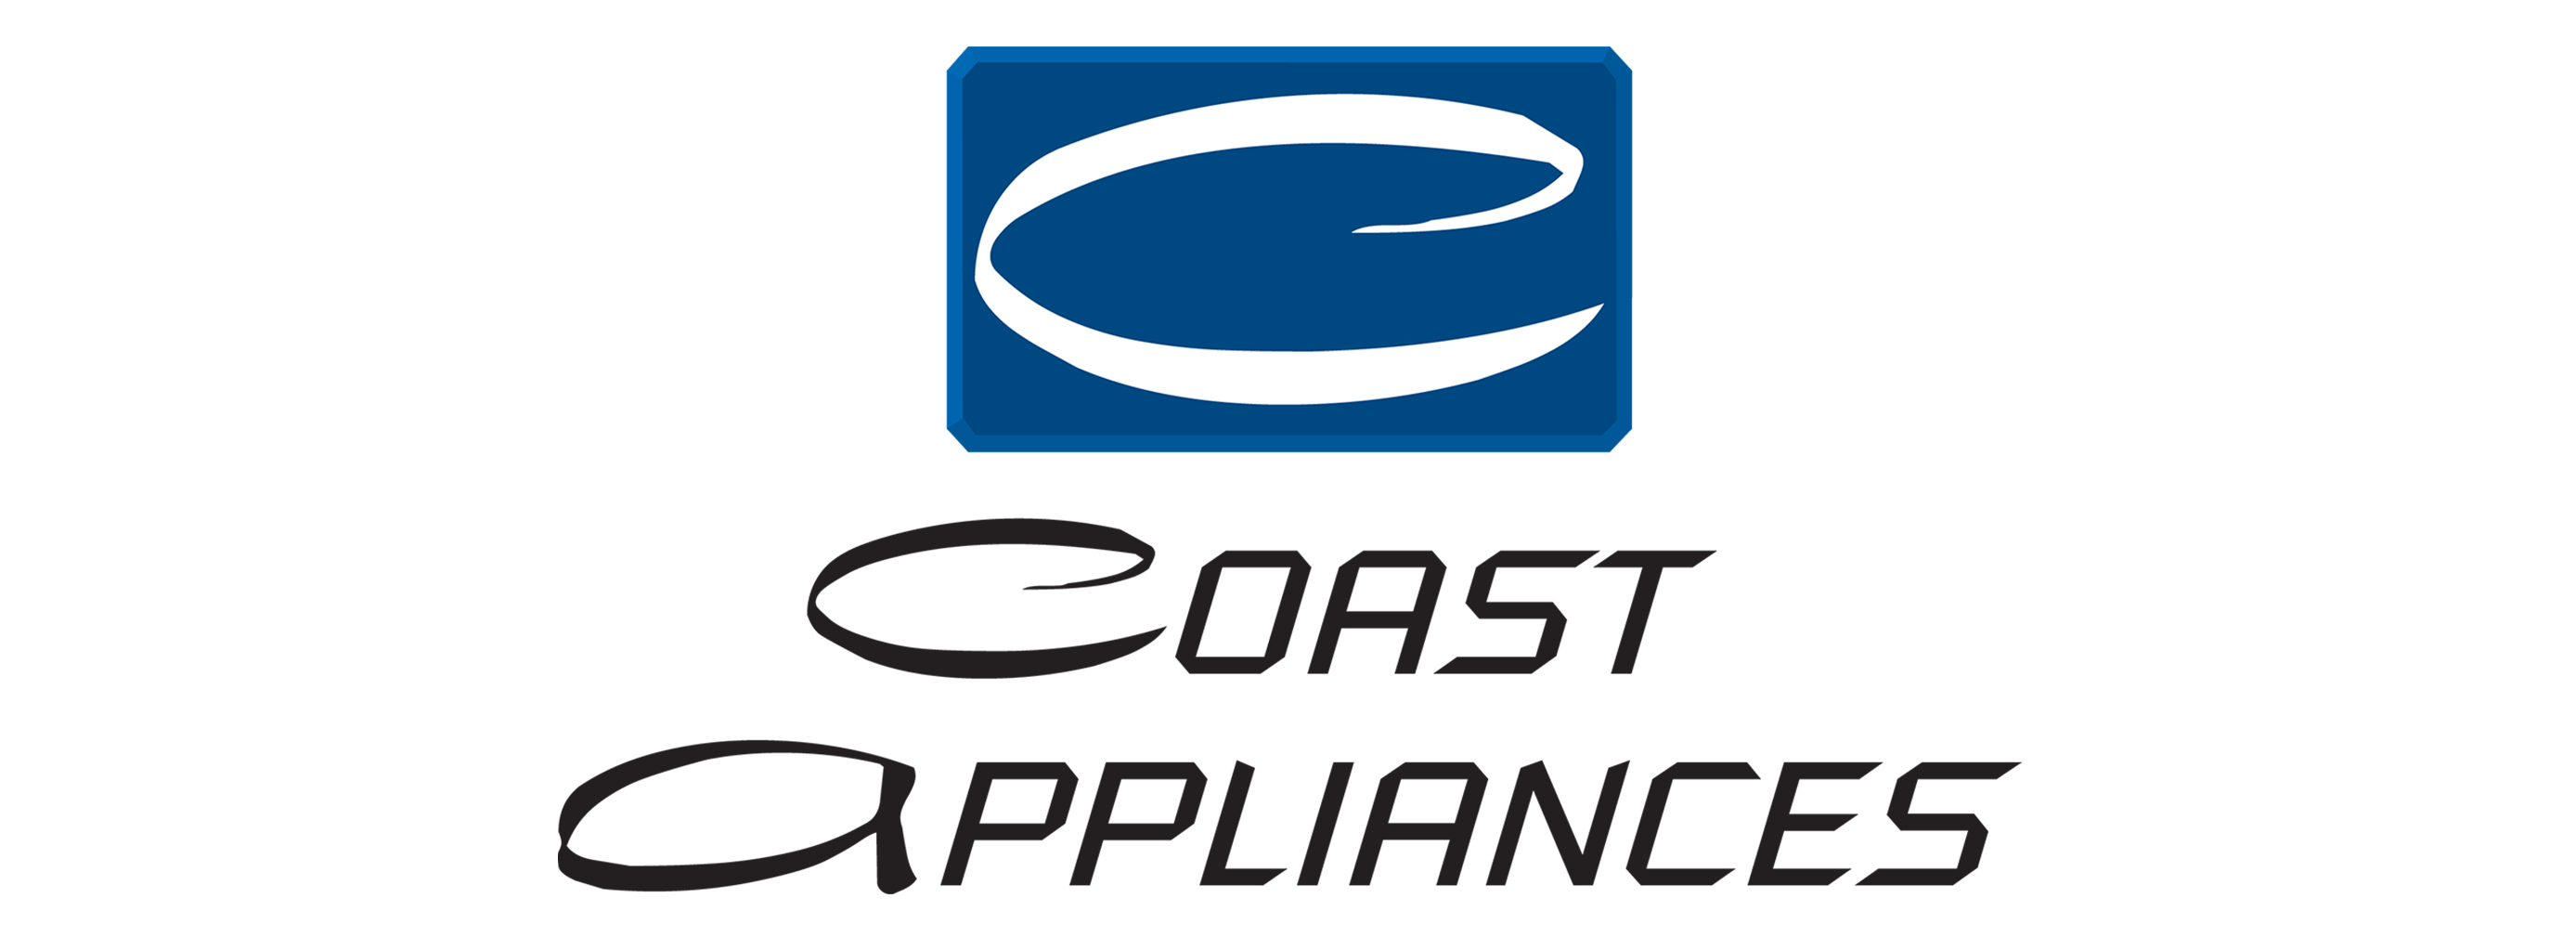 coastappliances_logo_web